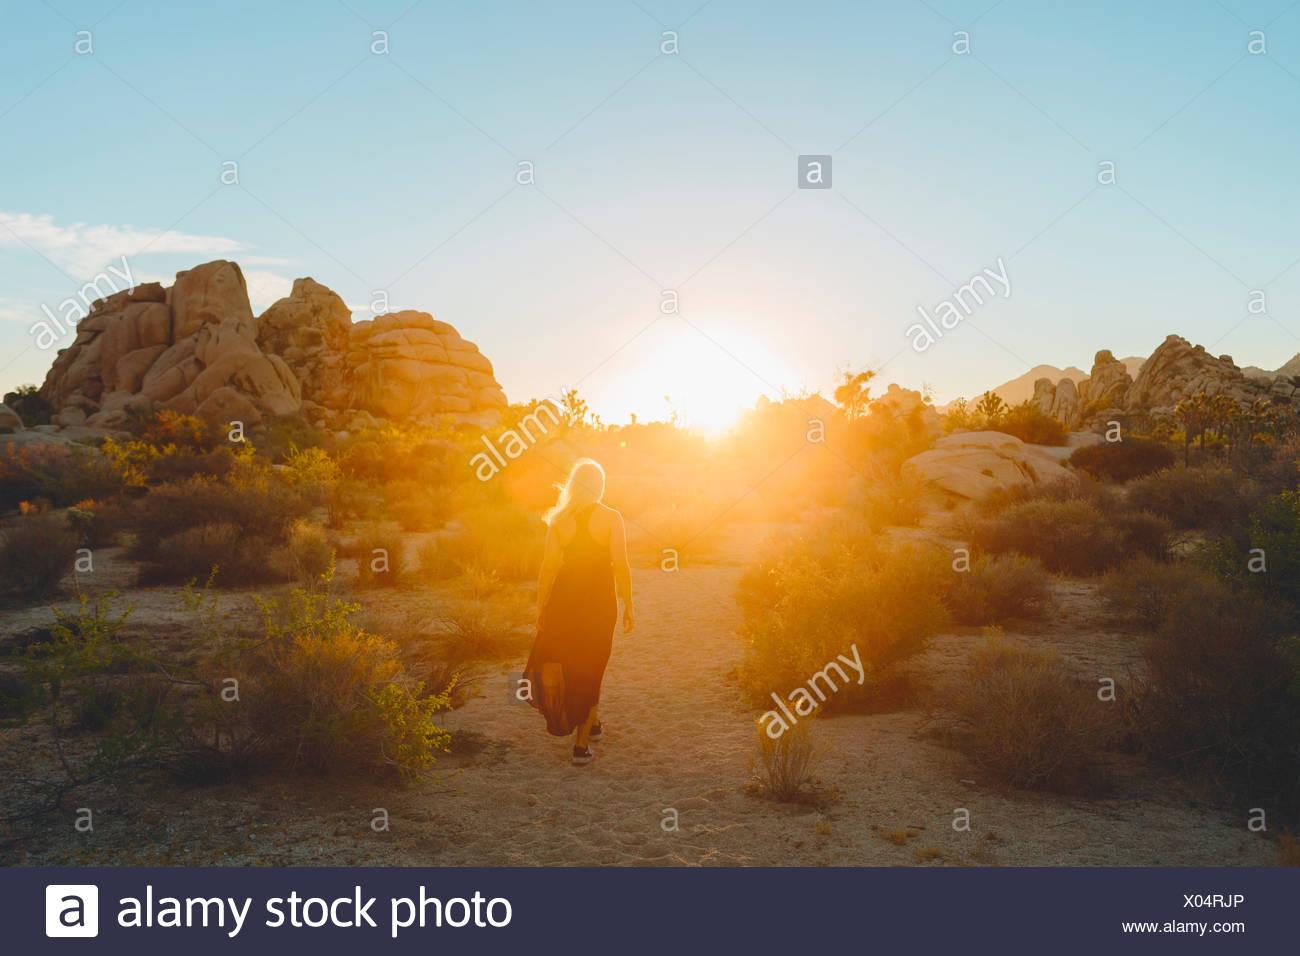 USA, California, Joshua Tree National Park, Frau trägt Kleid Wandern bei Sonnenuntergang Stockfoto